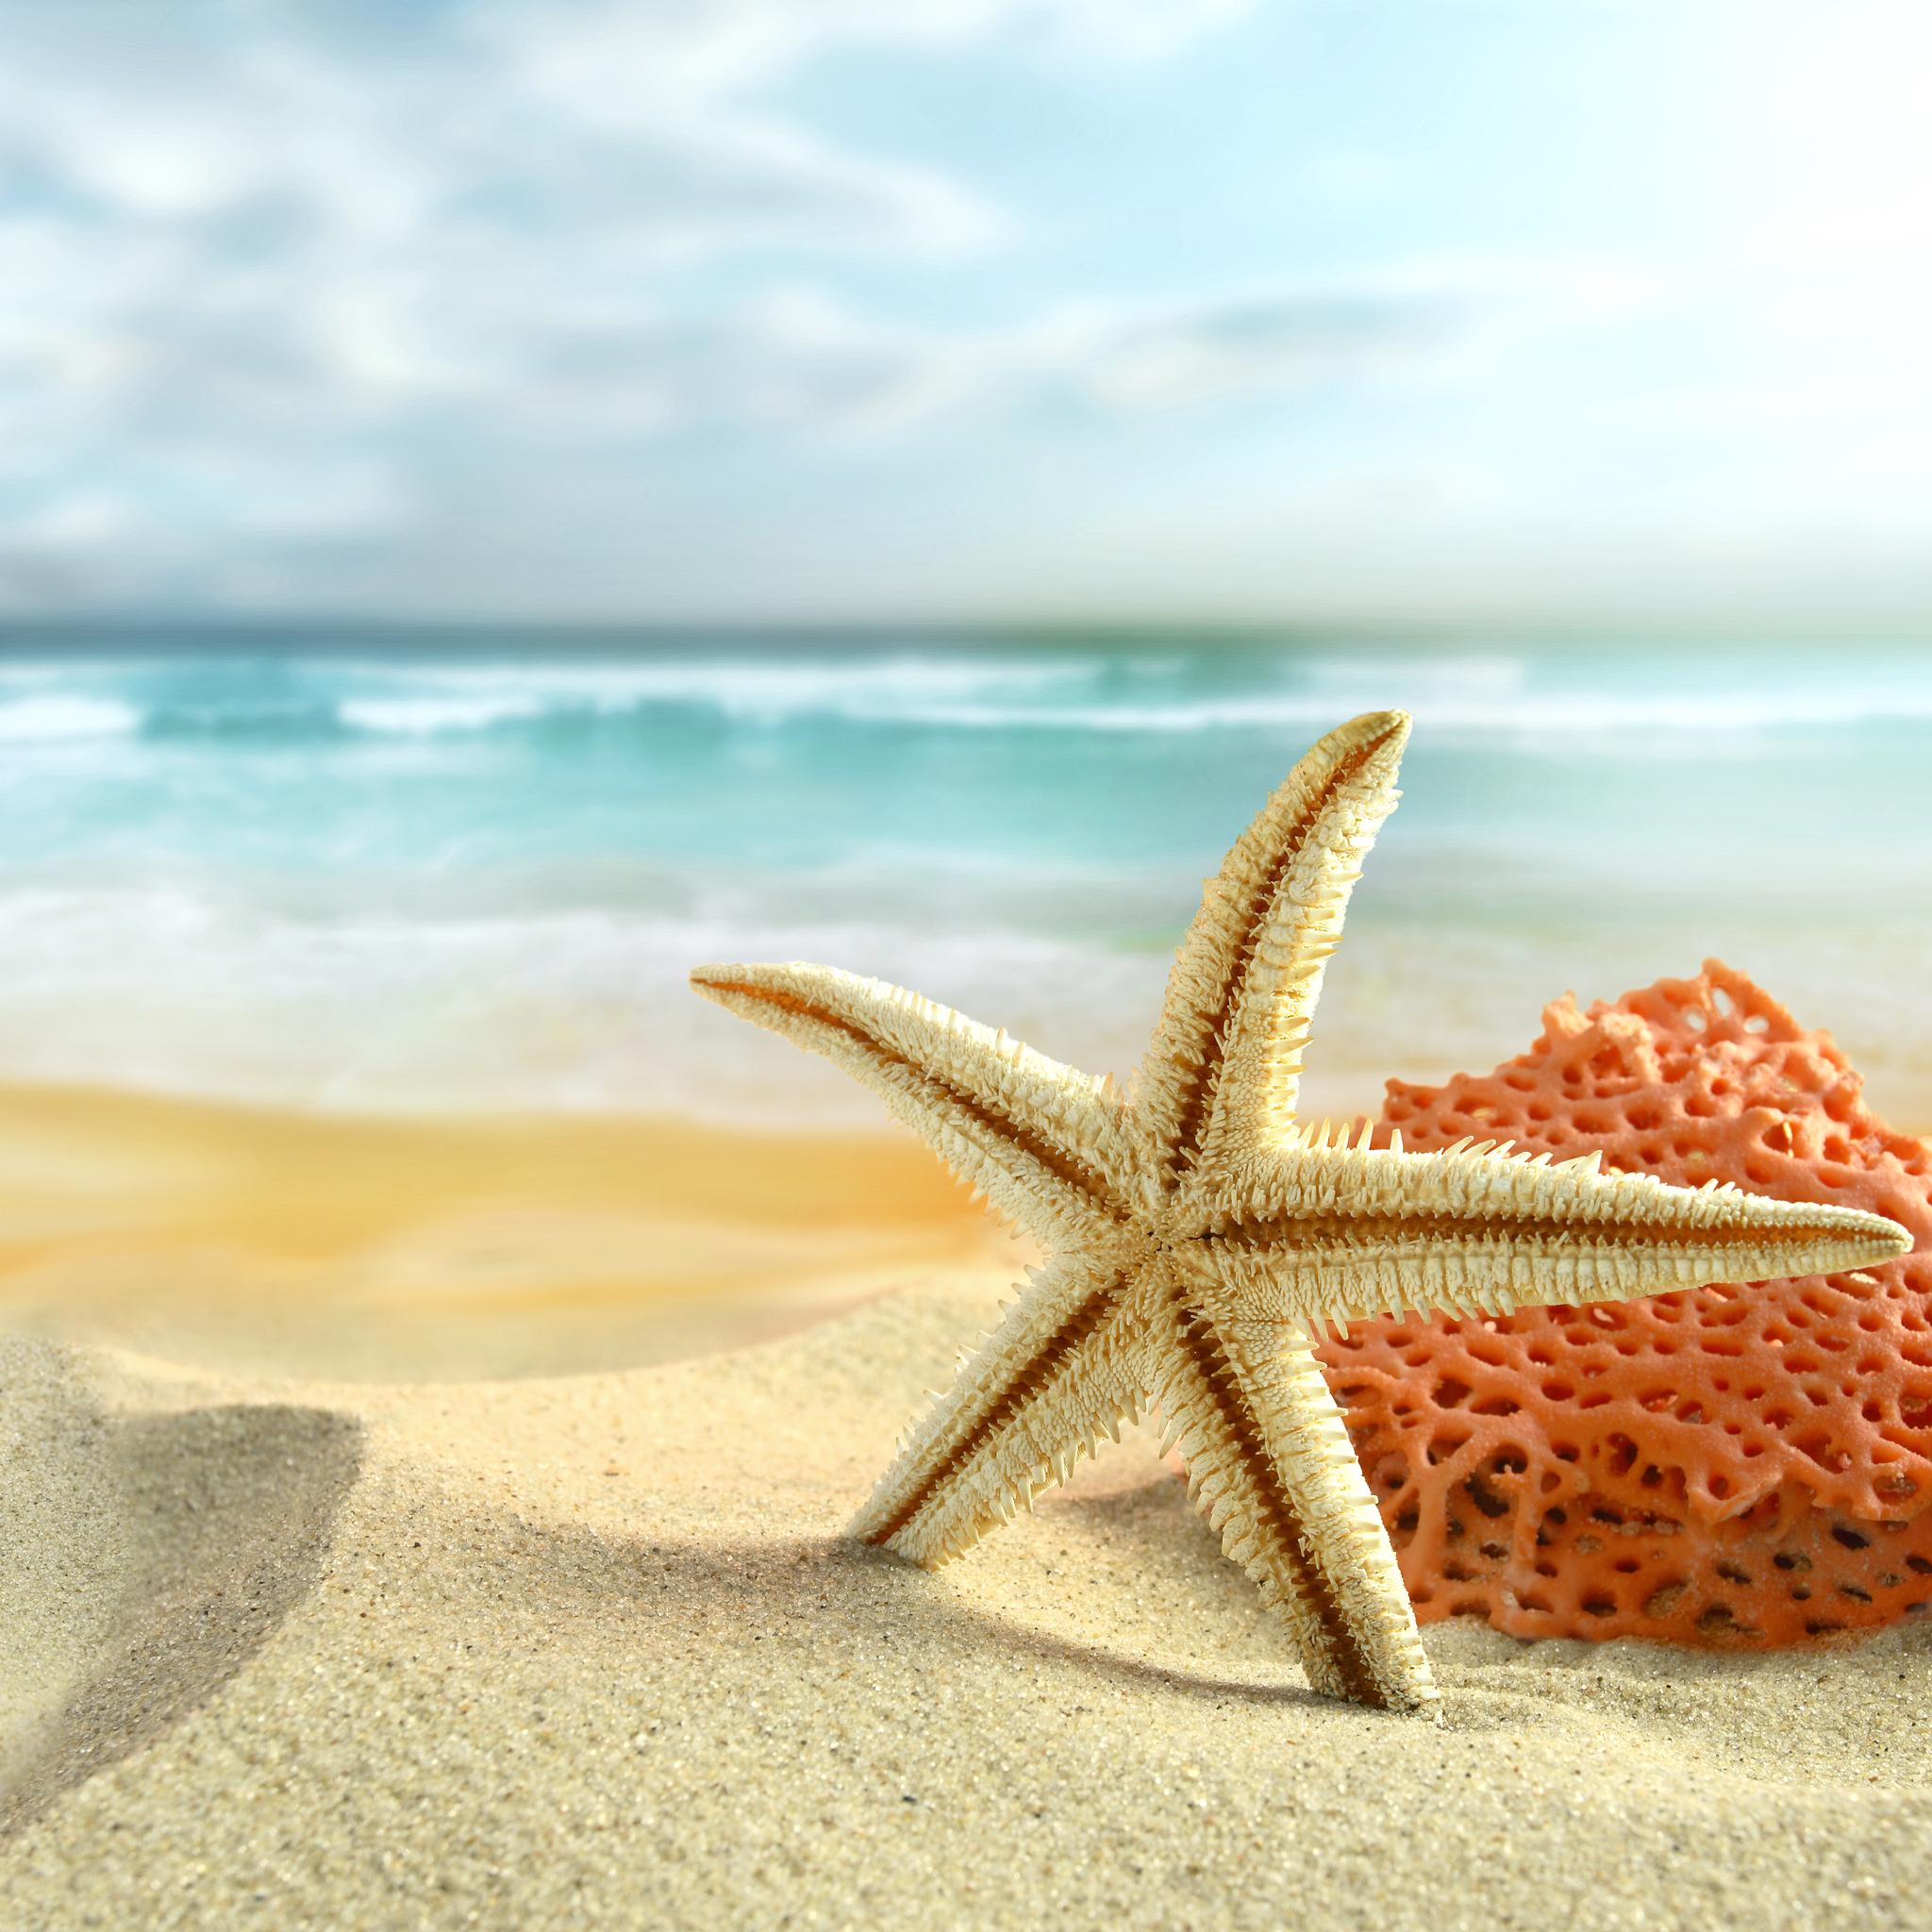 Beach Ipad Retina Wallpaper For Iphone X 8 7 6 Free